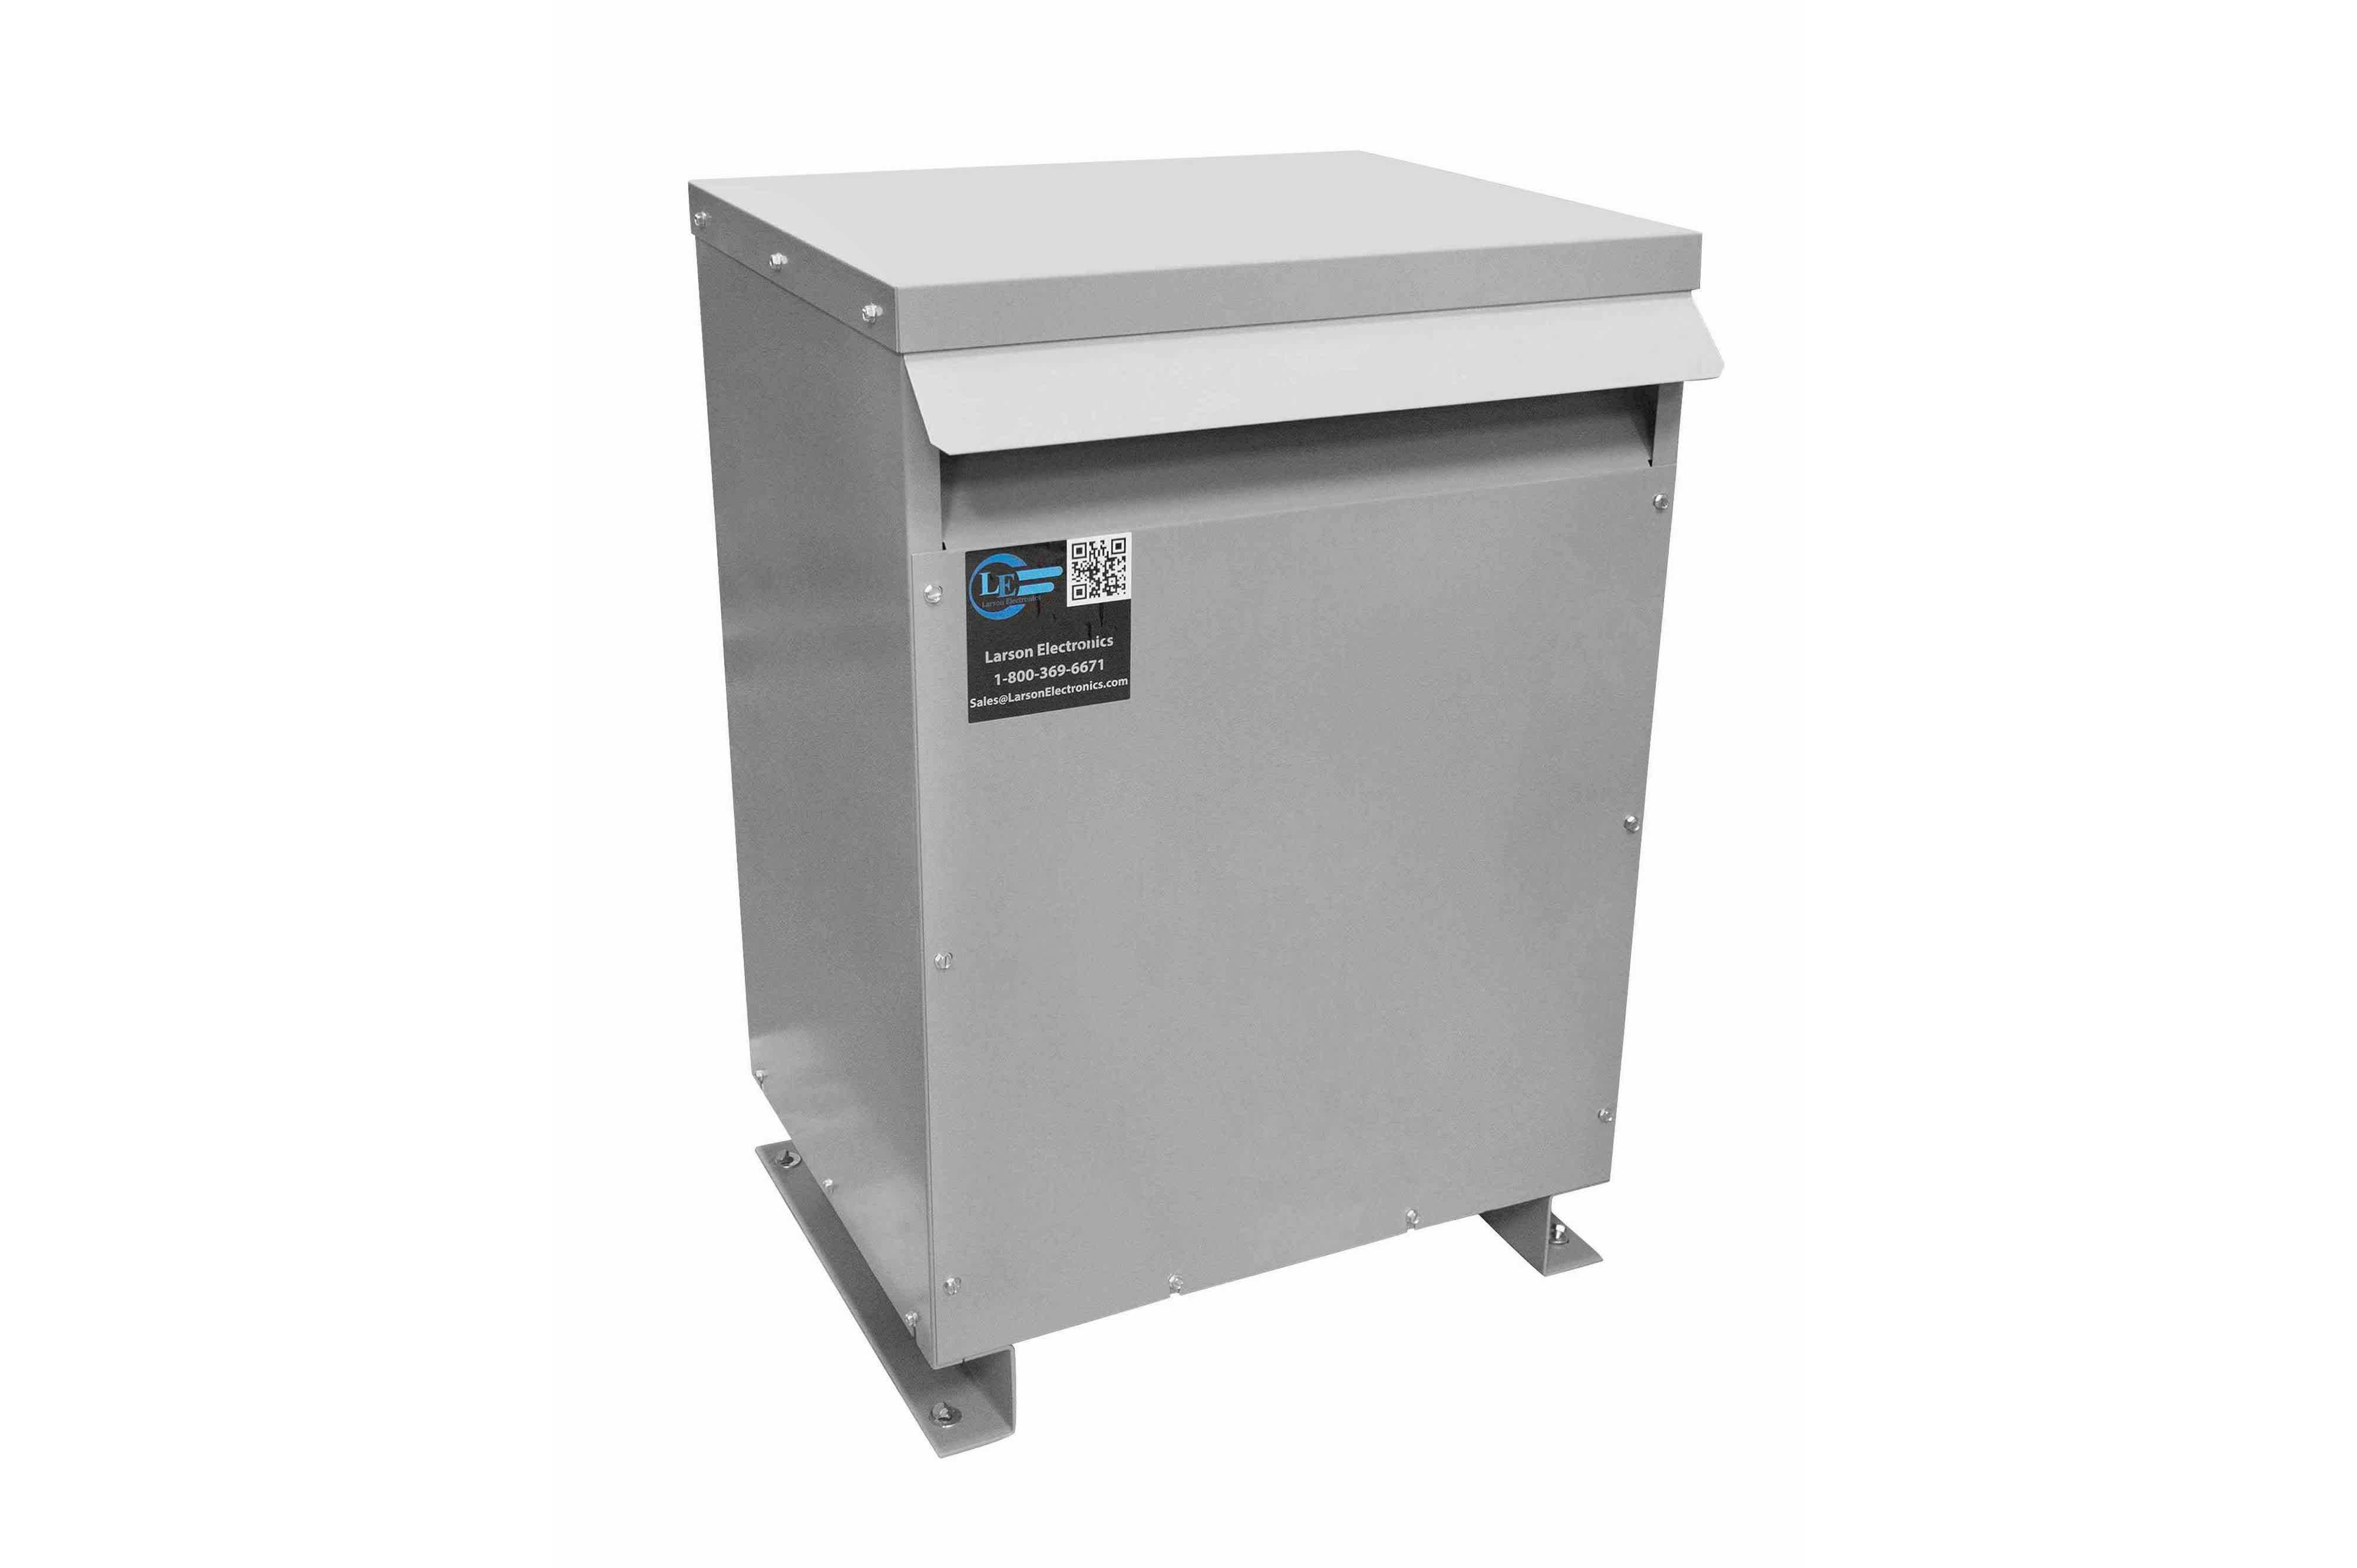 275 kVA 3PH Isolation Transformer, 600V Wye Primary, 380V Delta Secondary, N3R, Ventilated, 60 Hz